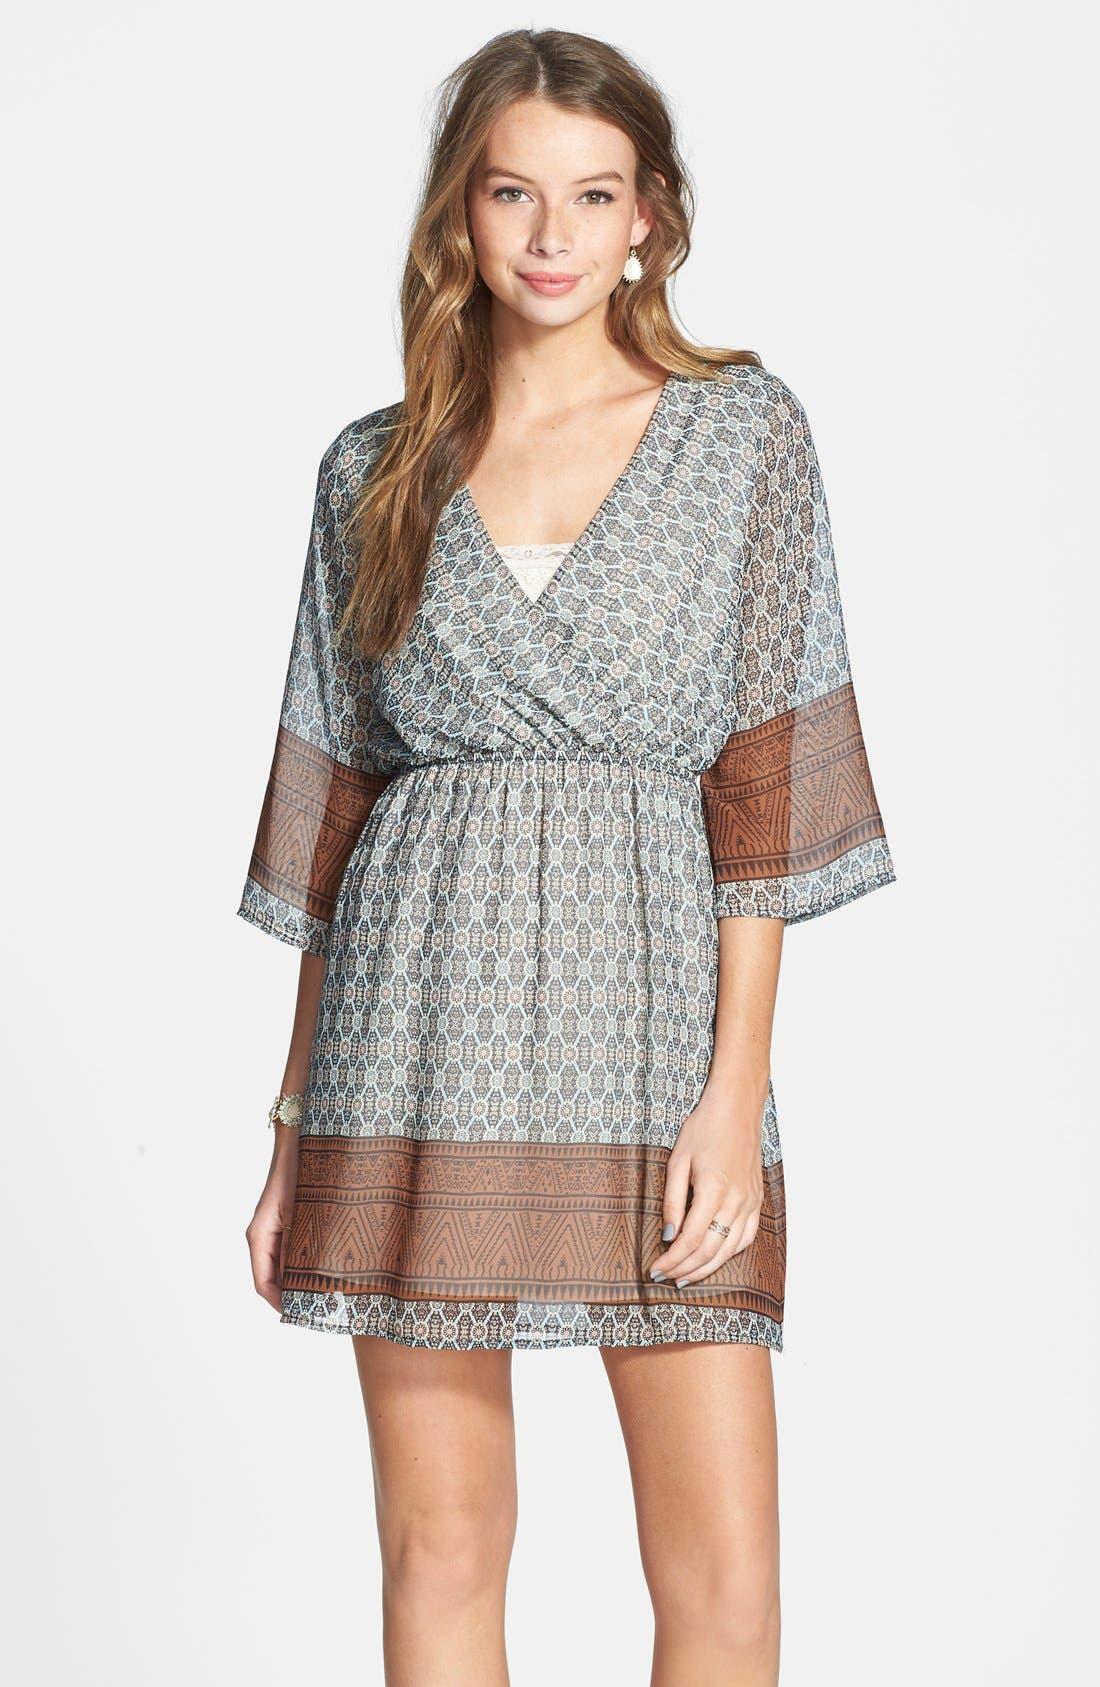 Alternate Image 1 Selected - Everly Border Print Surplice Dress (Juniors)